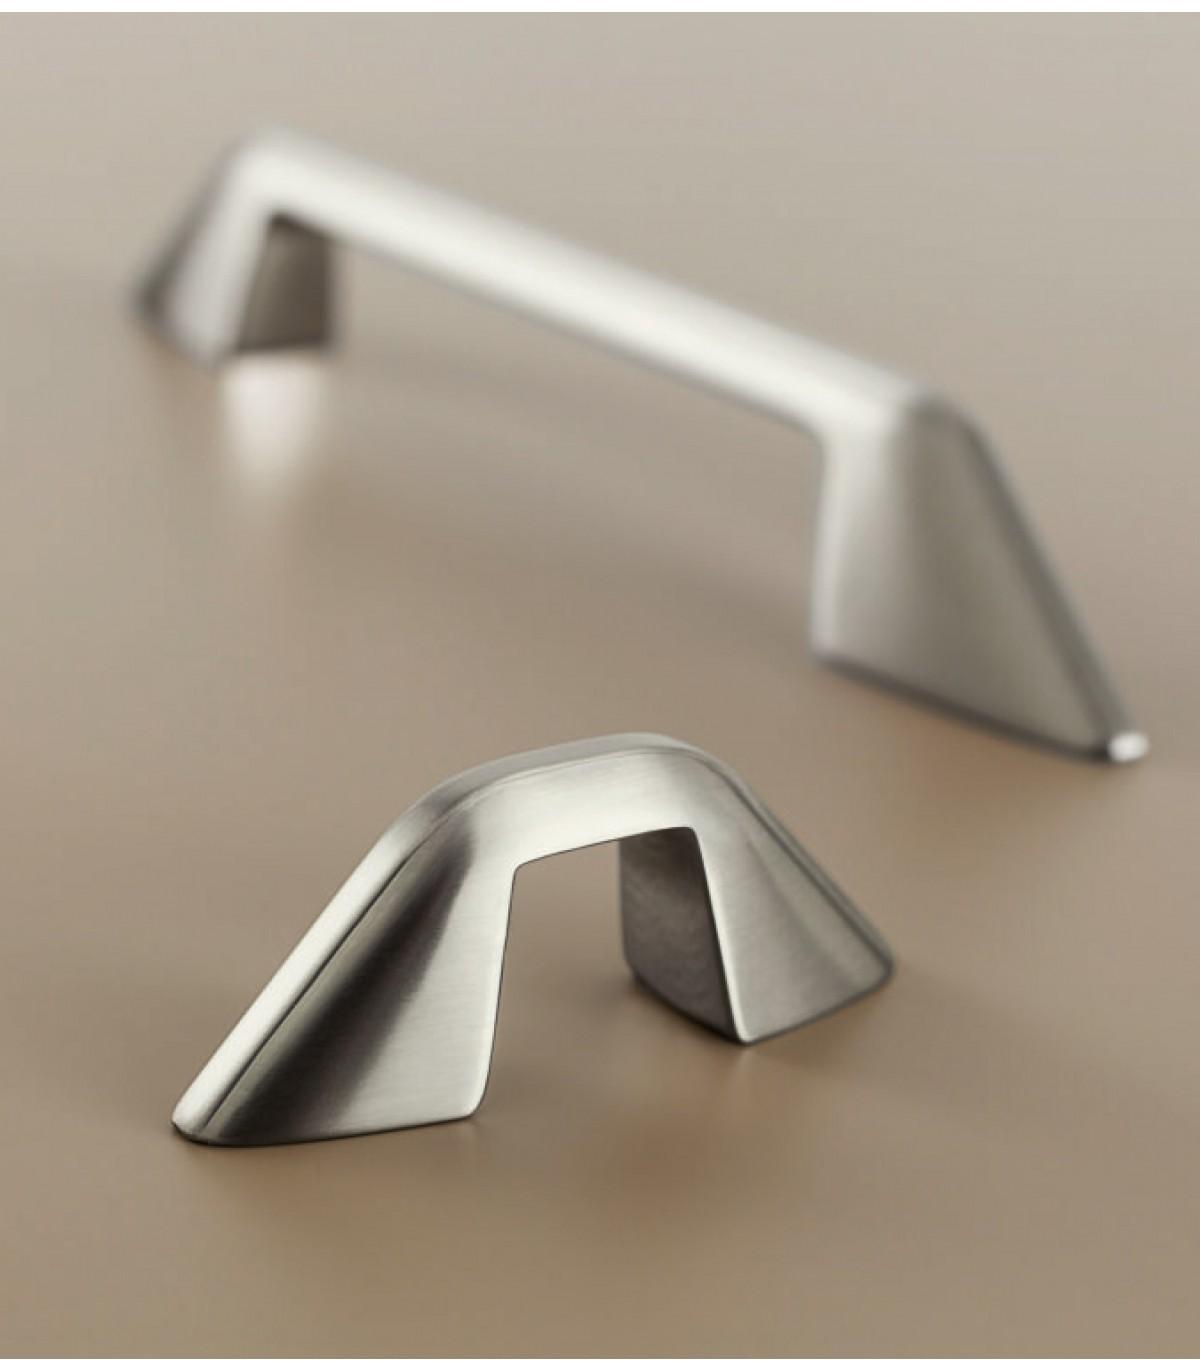 Poignee Bouton De Meuble Design Quadra Par Bosetti Marella